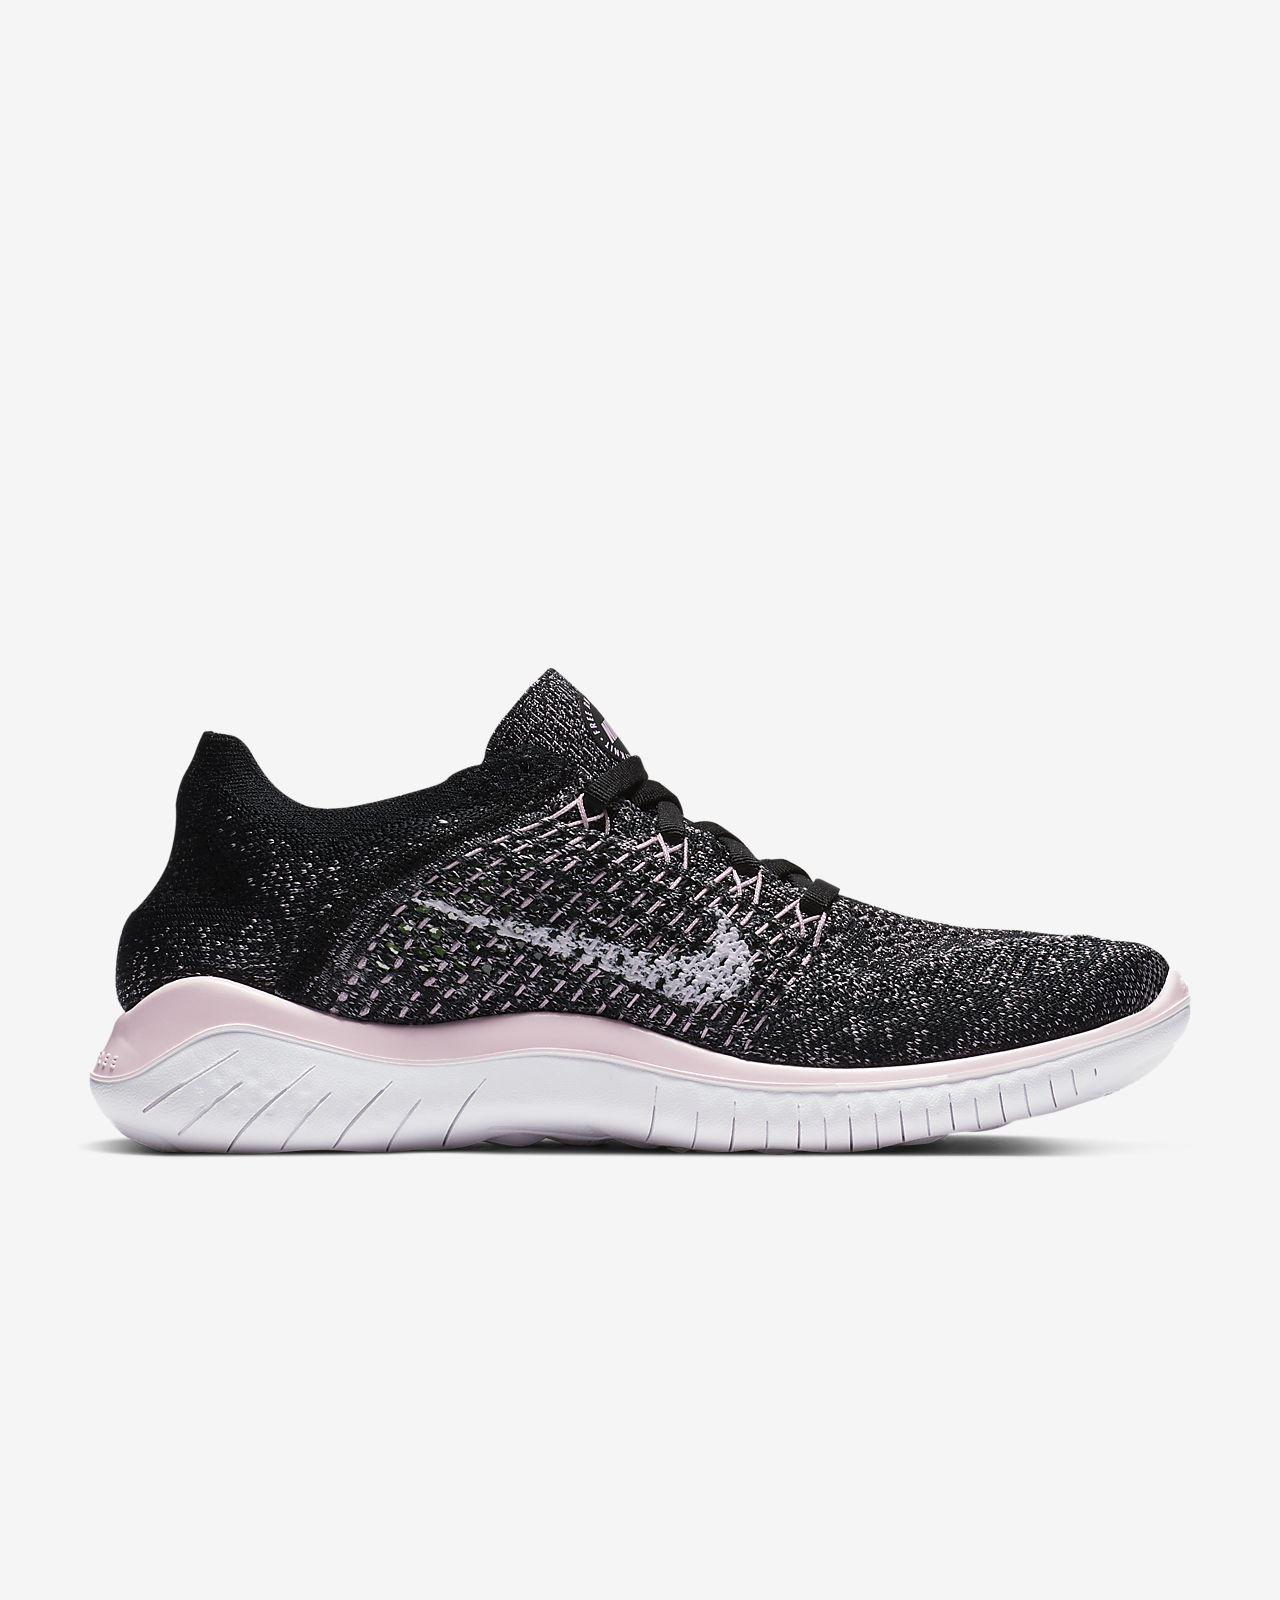 Chaussure de running Nike Free RN Flyknit 2018 pour Femme